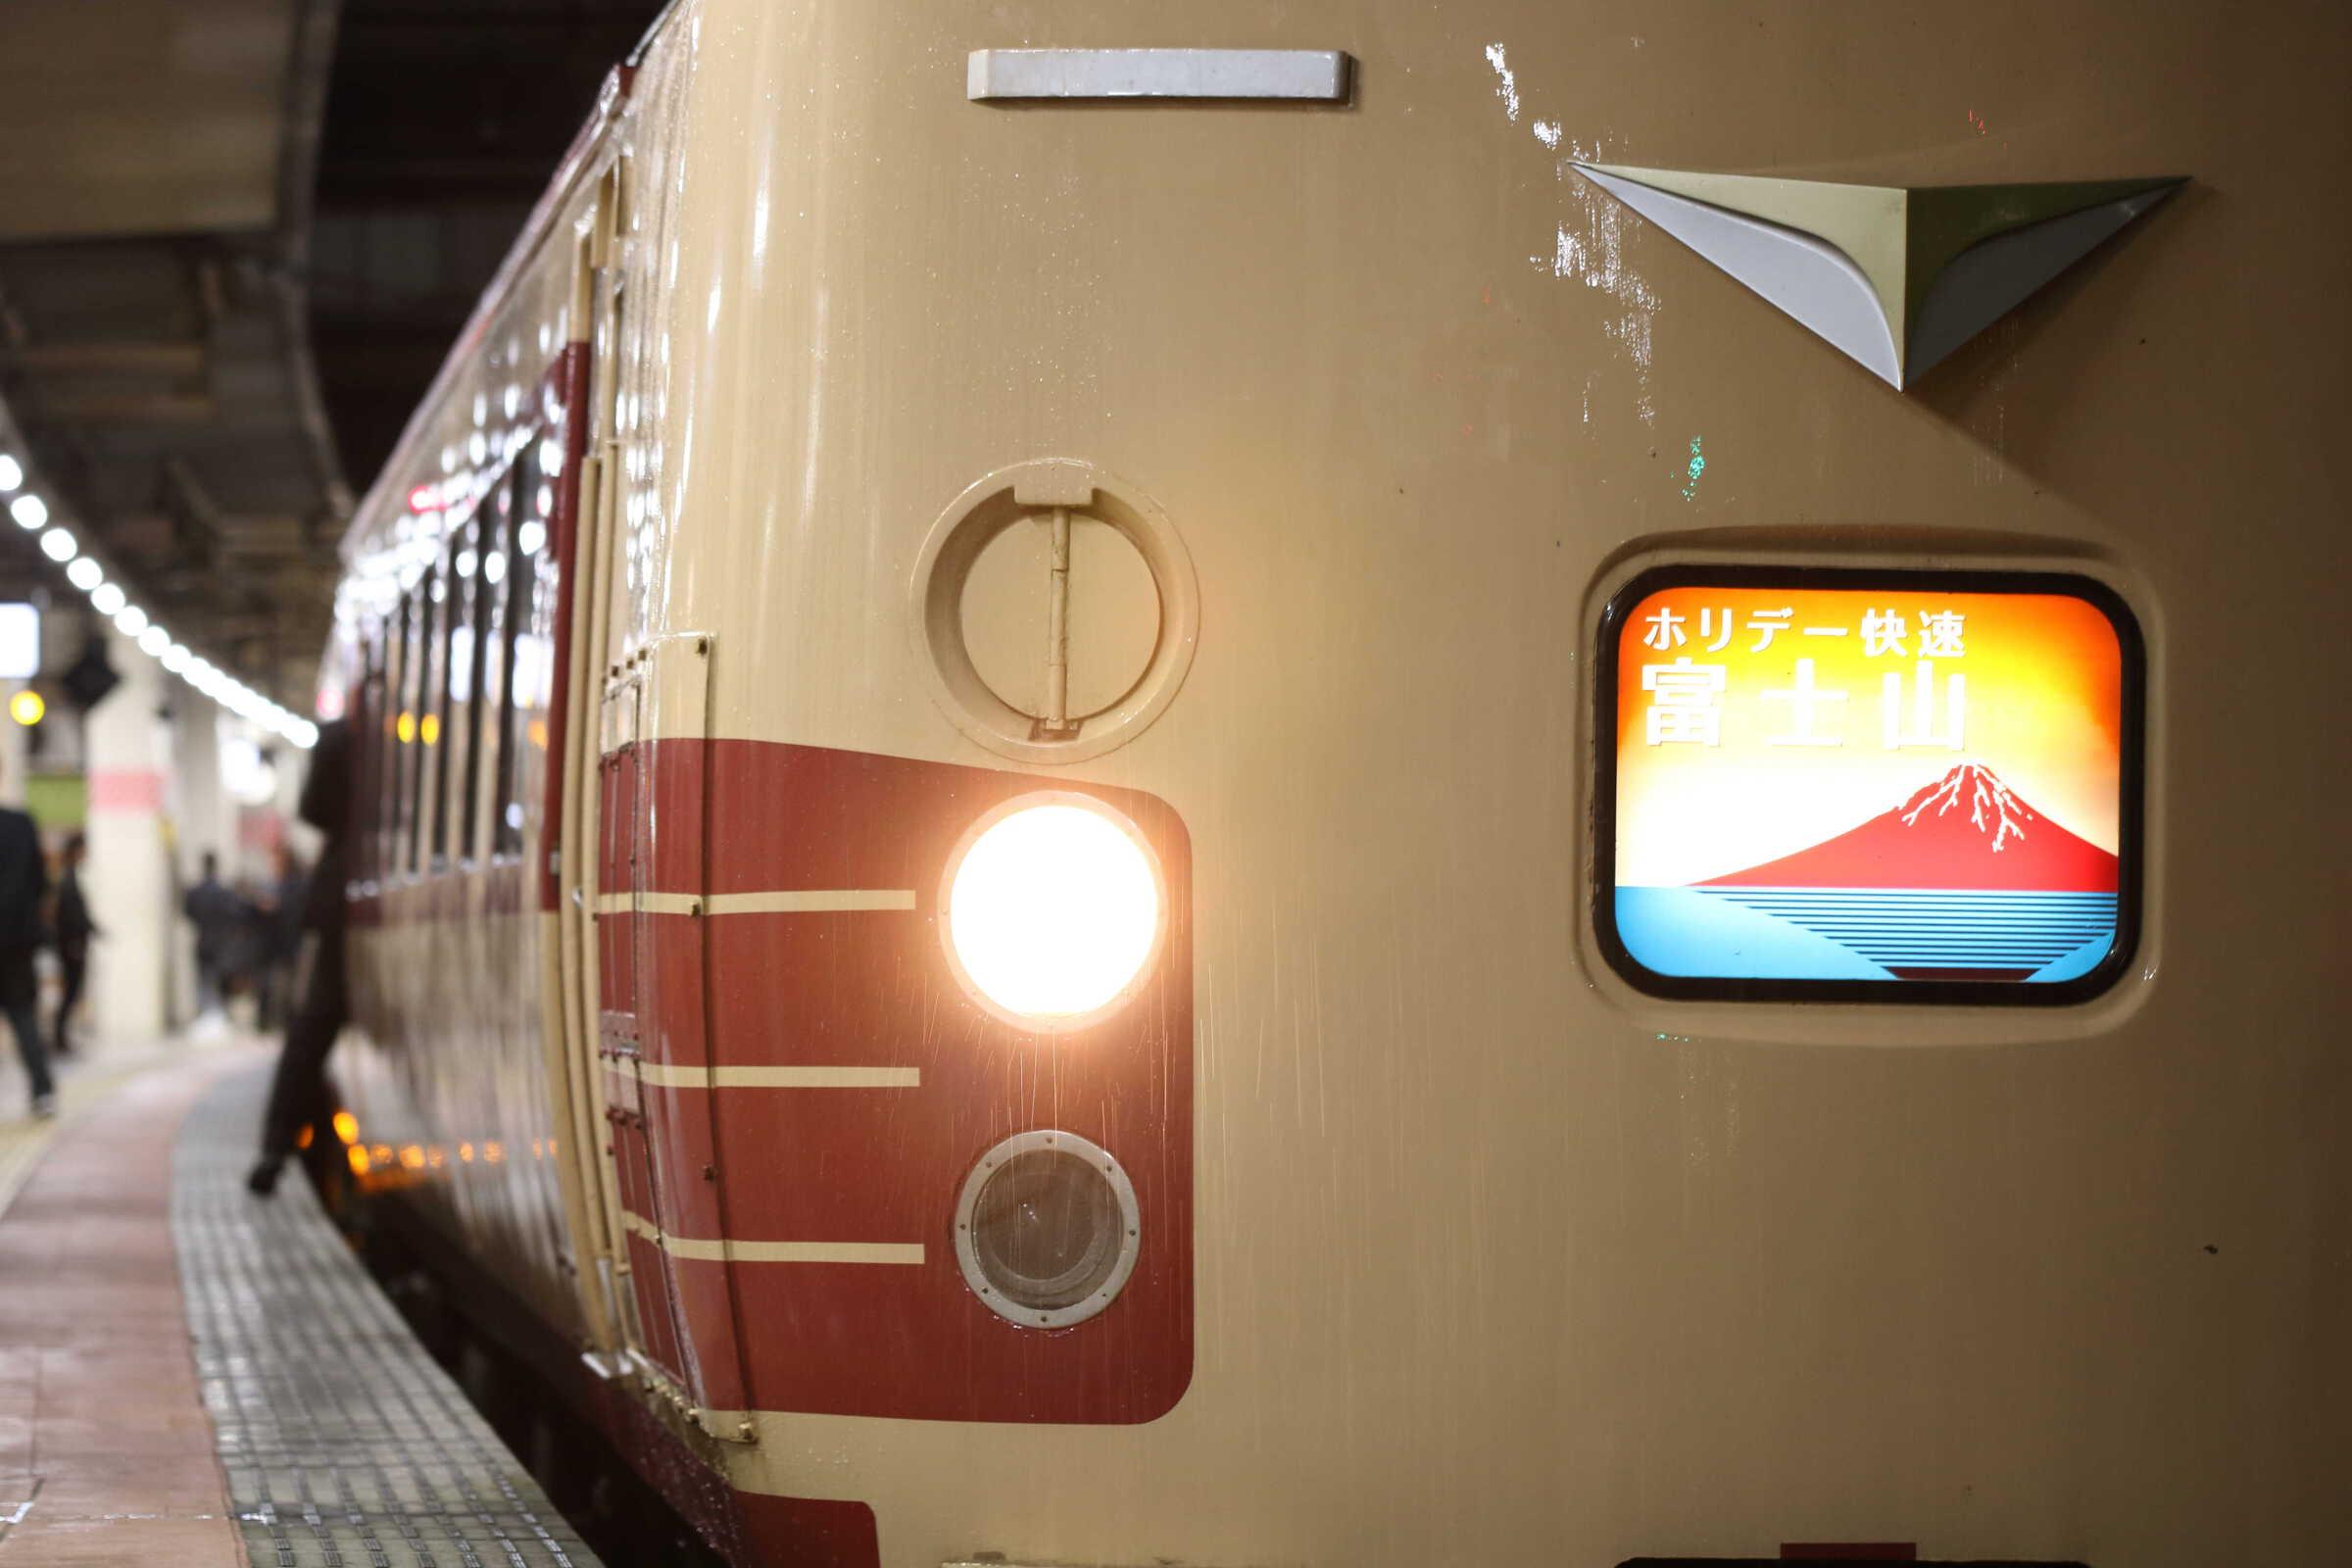 8570M 快速 ホリデー快速富士山2号 189系 八トタM51編成